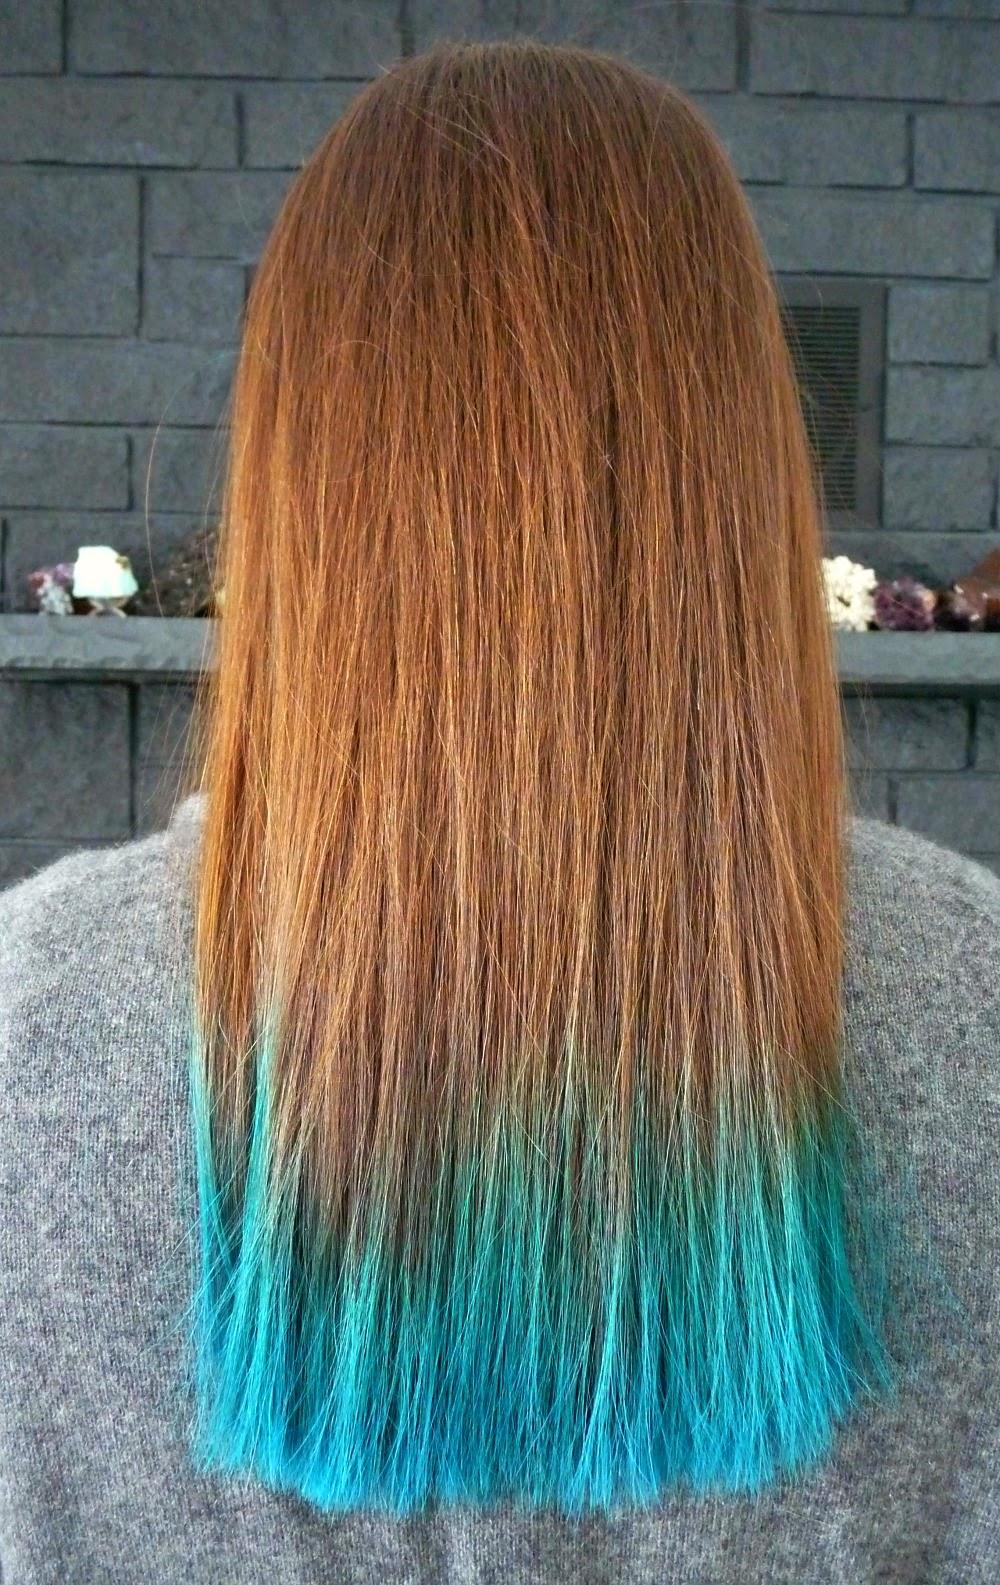 Brunette hair dip dyed aqua